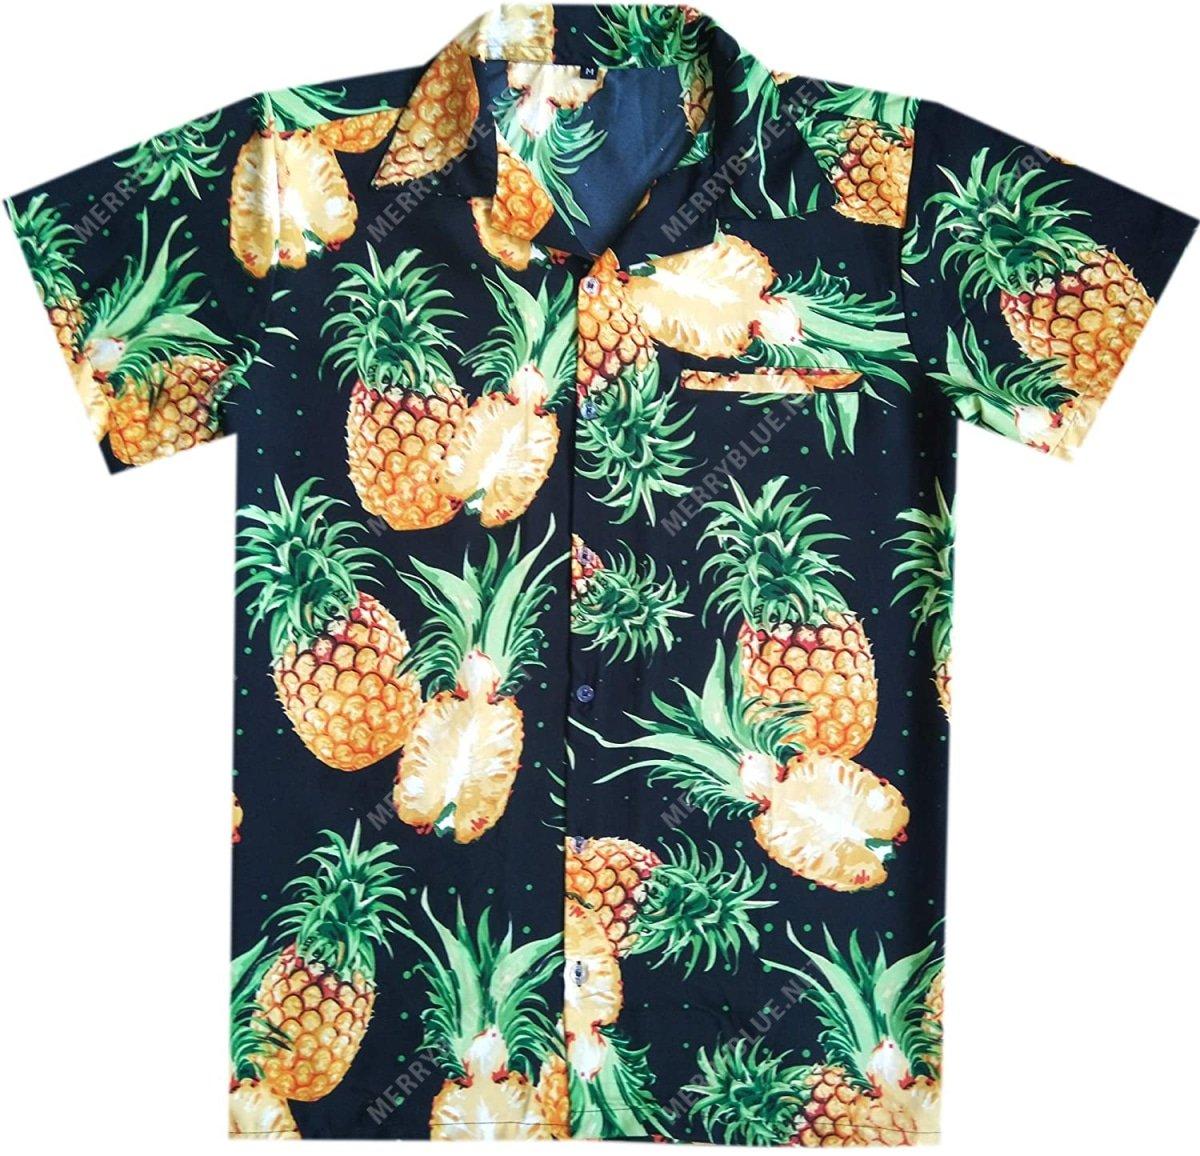 pineapple tropical all over printed hawaiian shirt 2